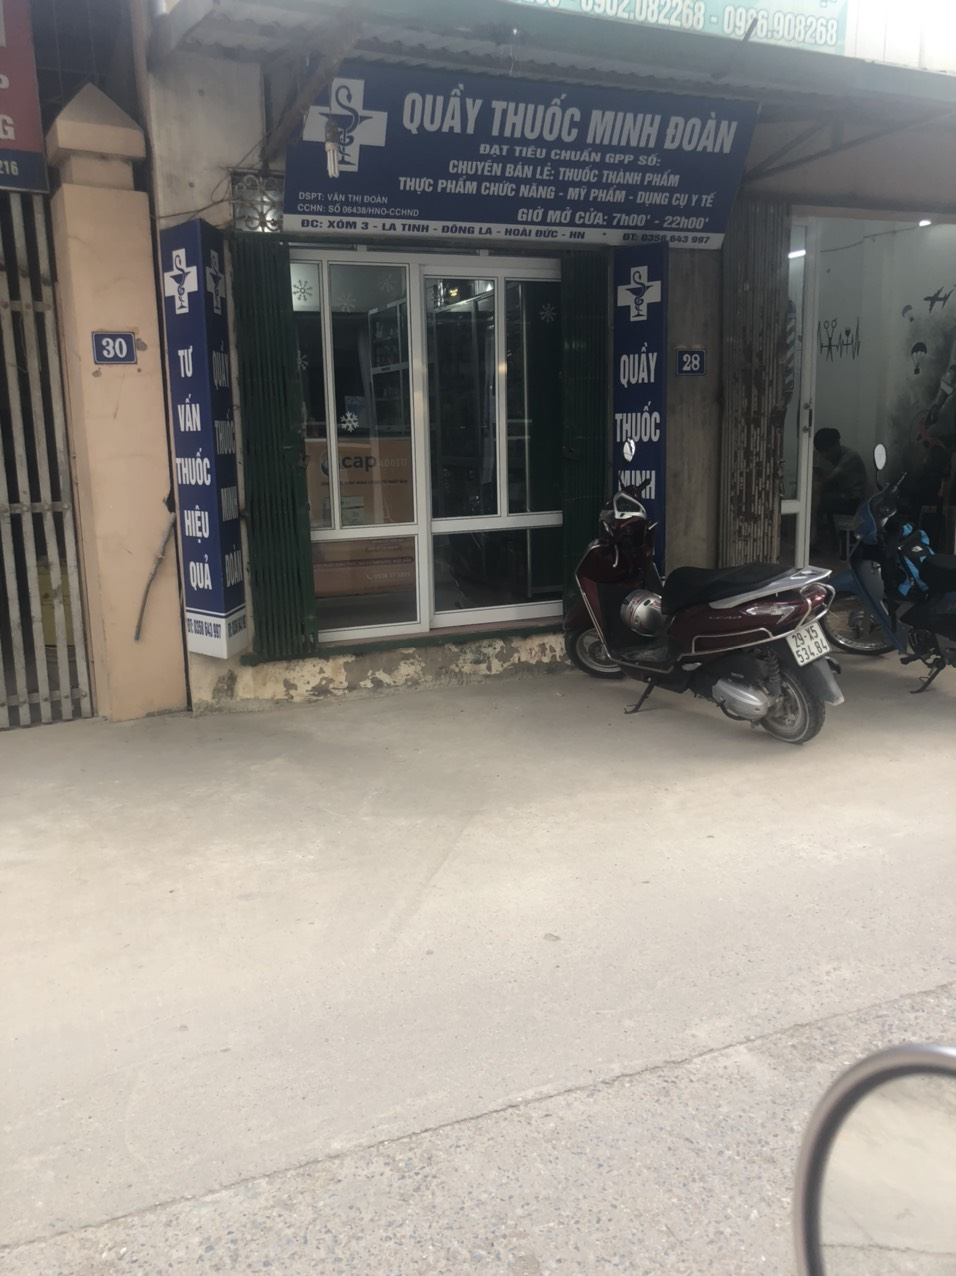 QT Minh Đoàn